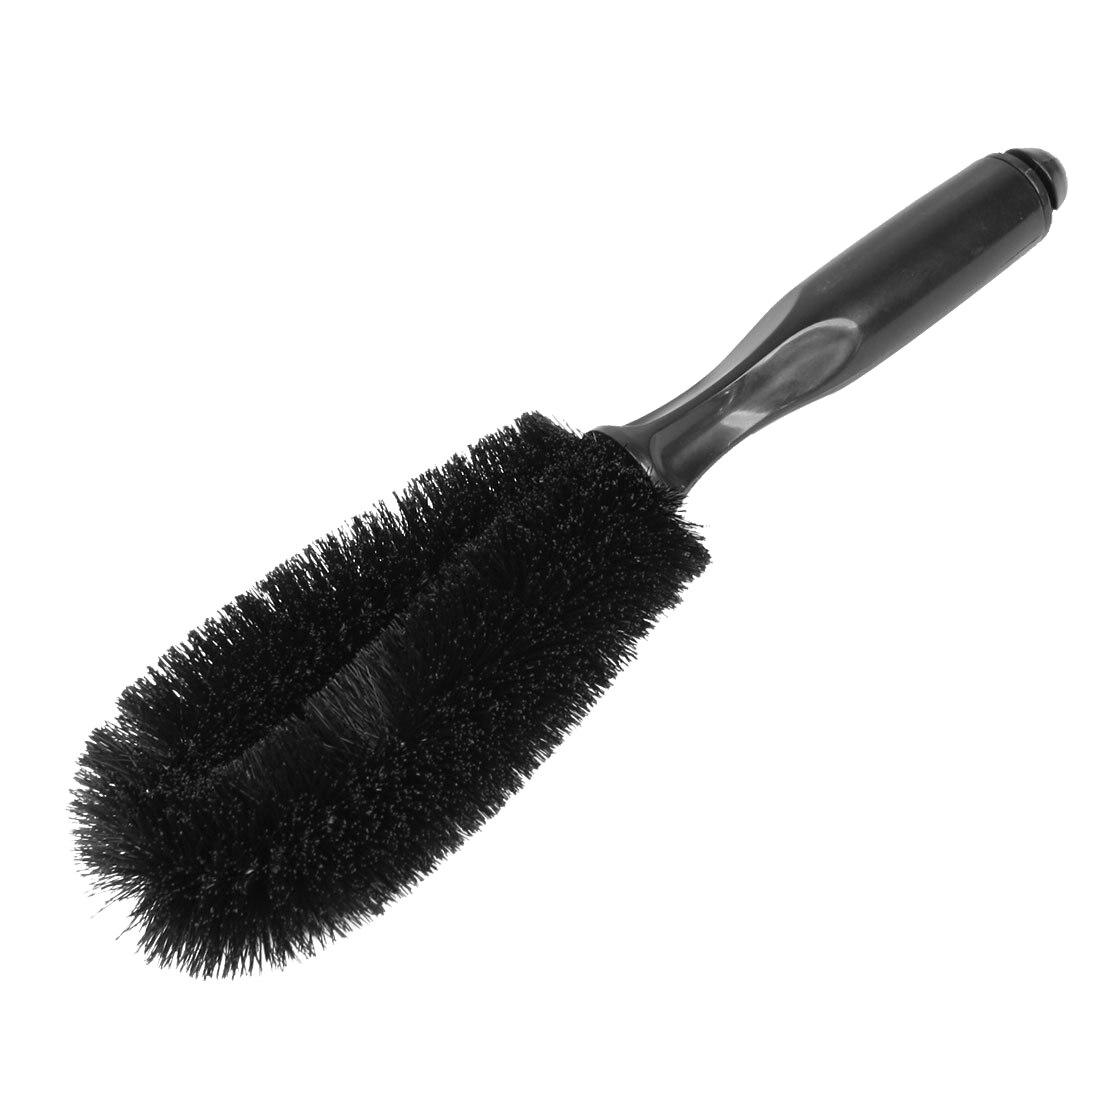 New Black Truck Car Auto Wheel Tire Rim Brush Wash Cleaning Tool 10.6 Long